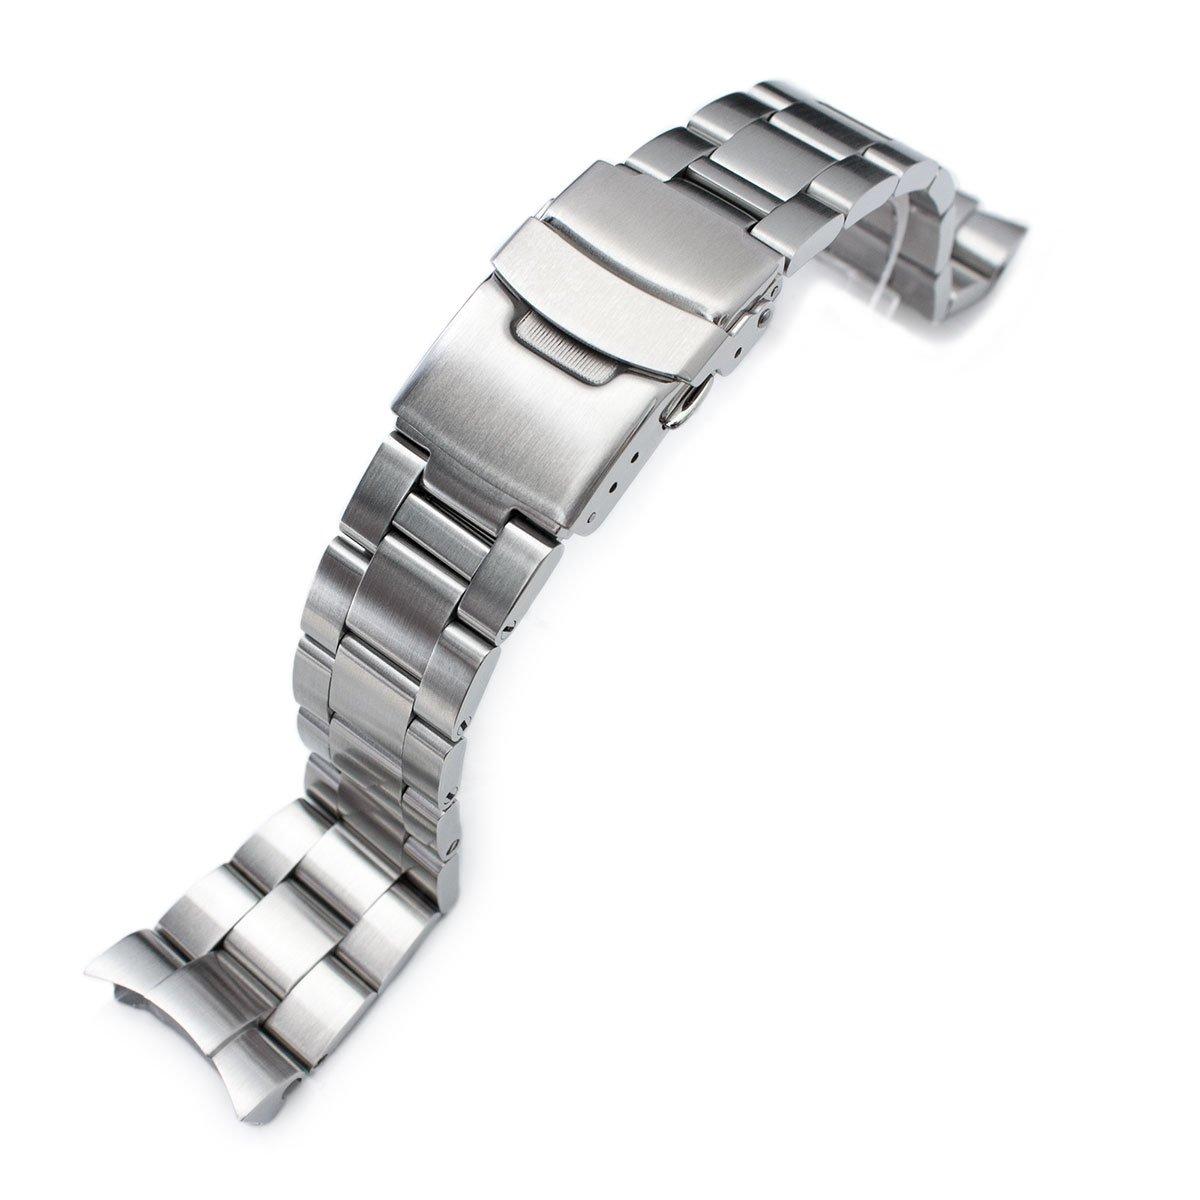 MiLTAT 22mm Watch Band for Seiko SKX007 SKX009 SKX173 SKX175, Super-O Solid Screw-Links